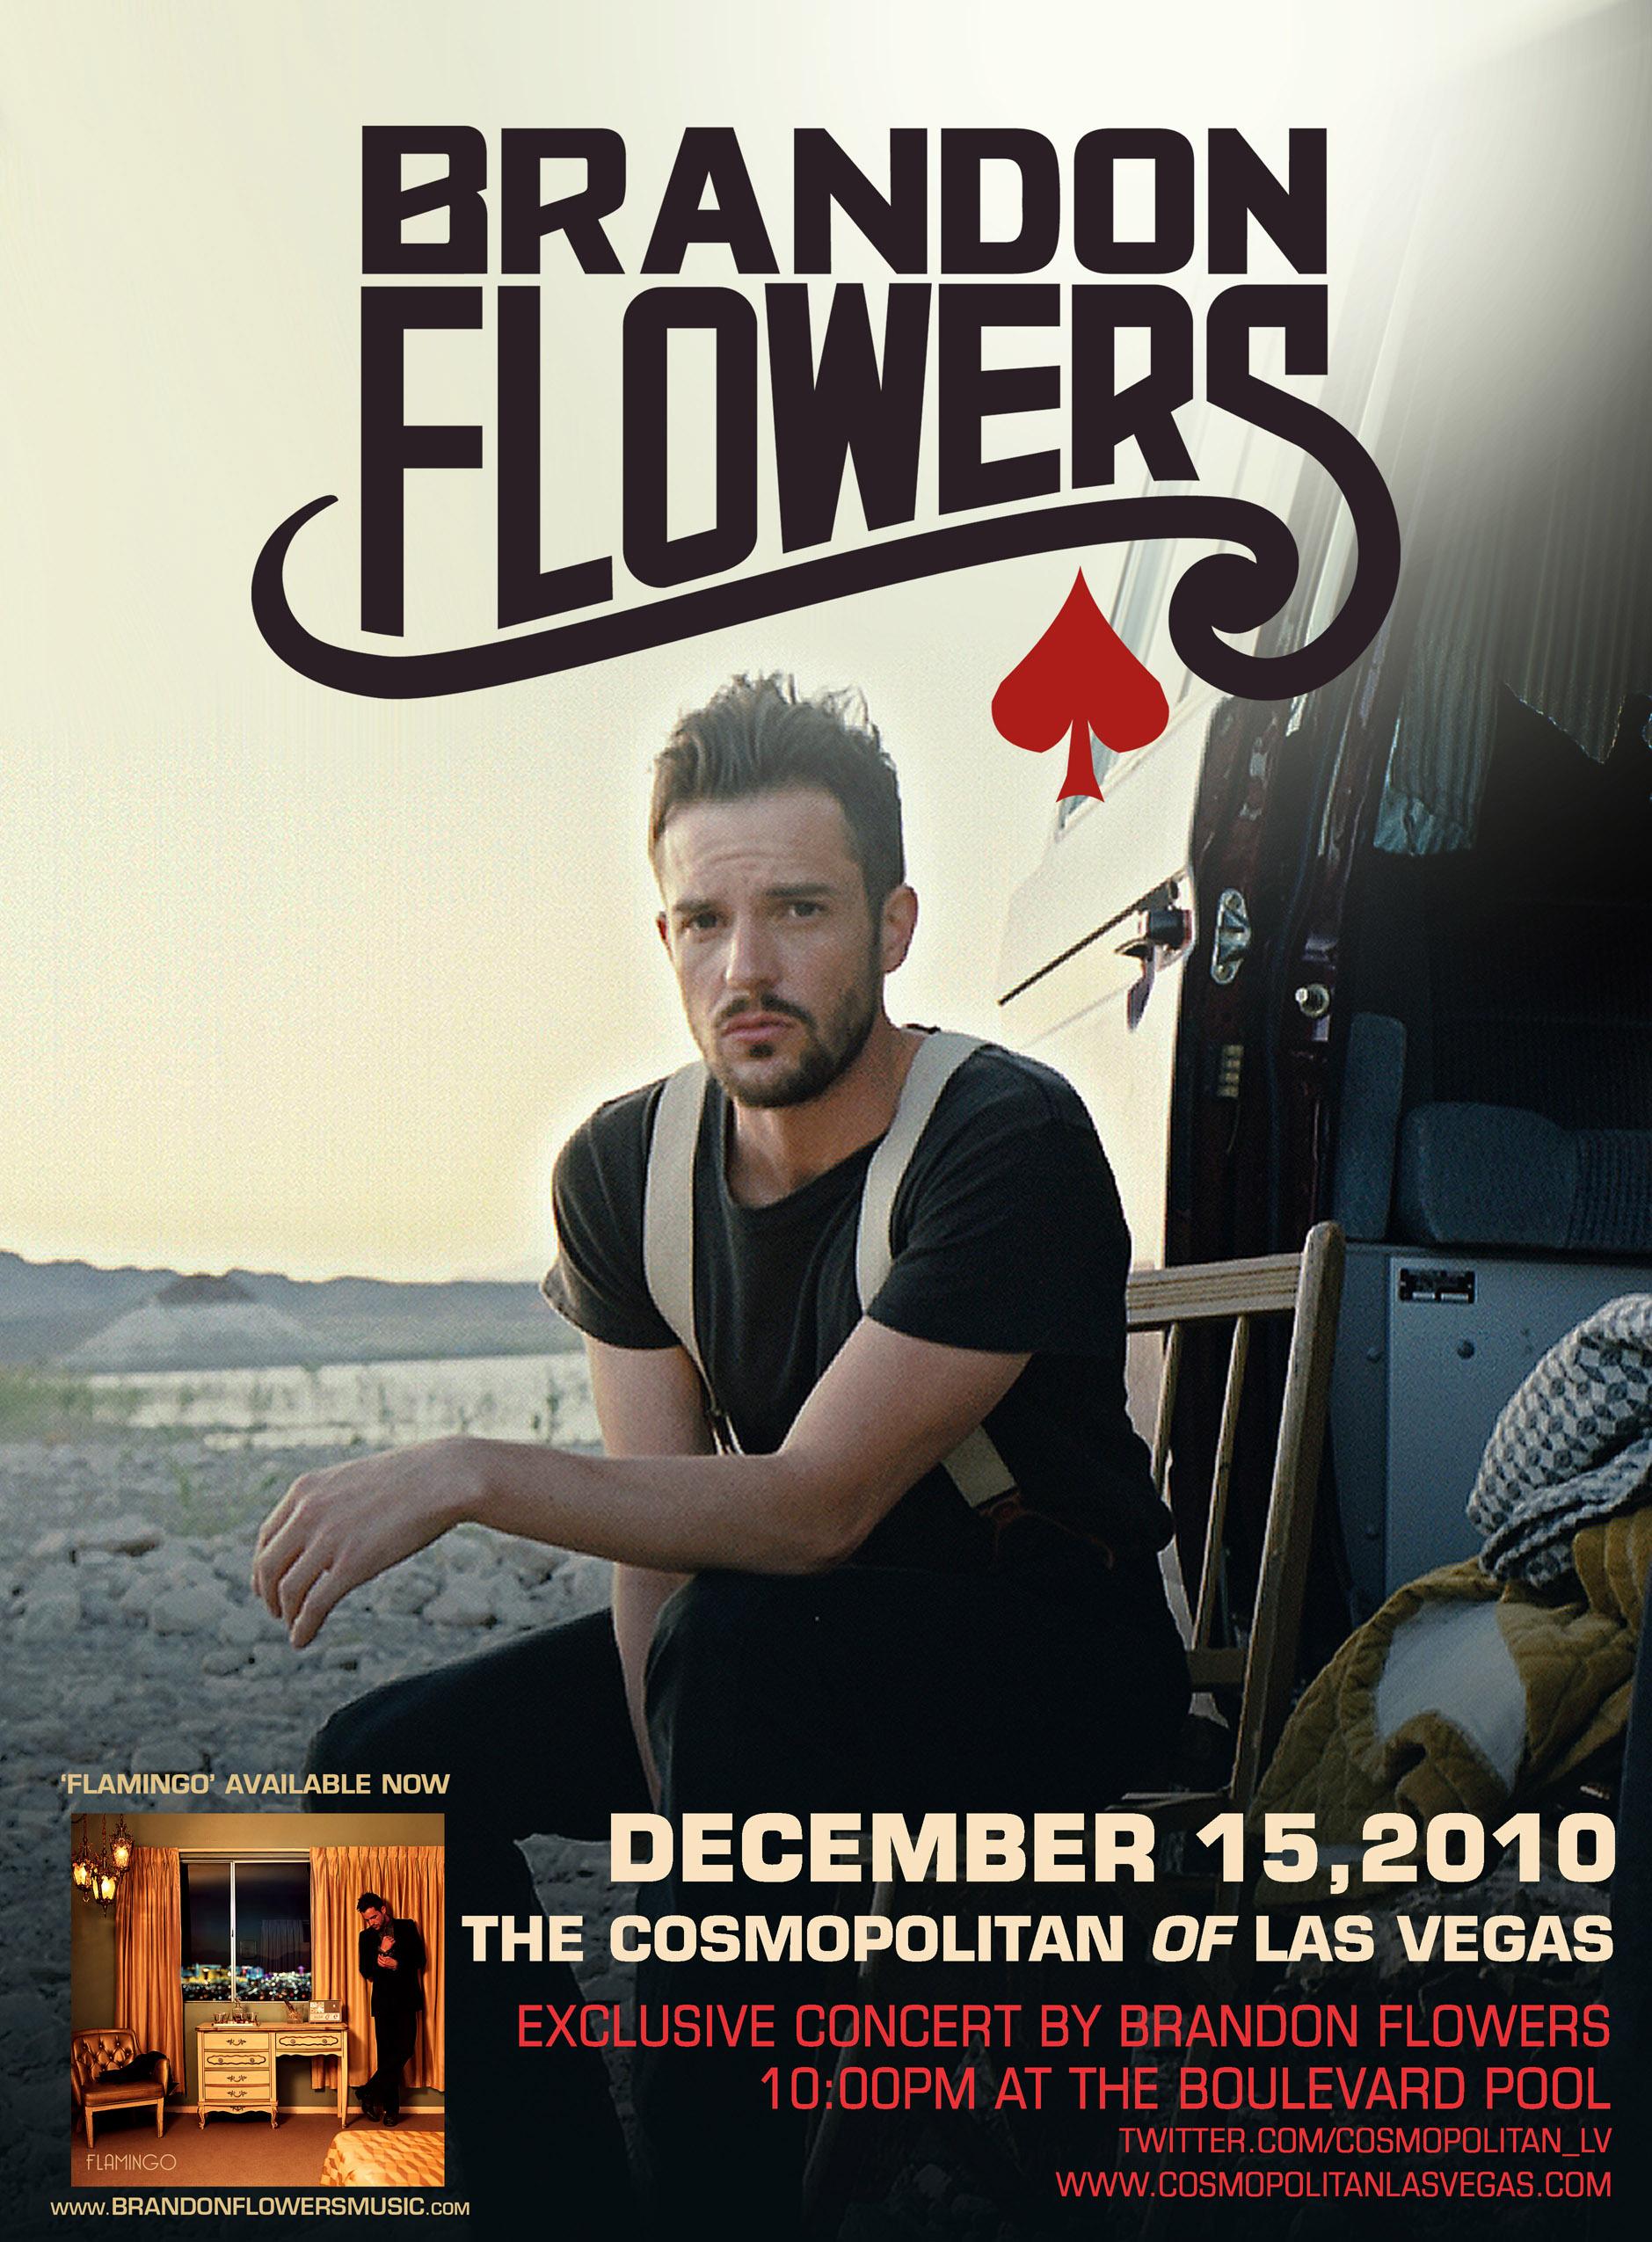 NOVEMBER 22 26th The Cosmopolitan of Las Vegas Brandon Flowers Concert Ticke